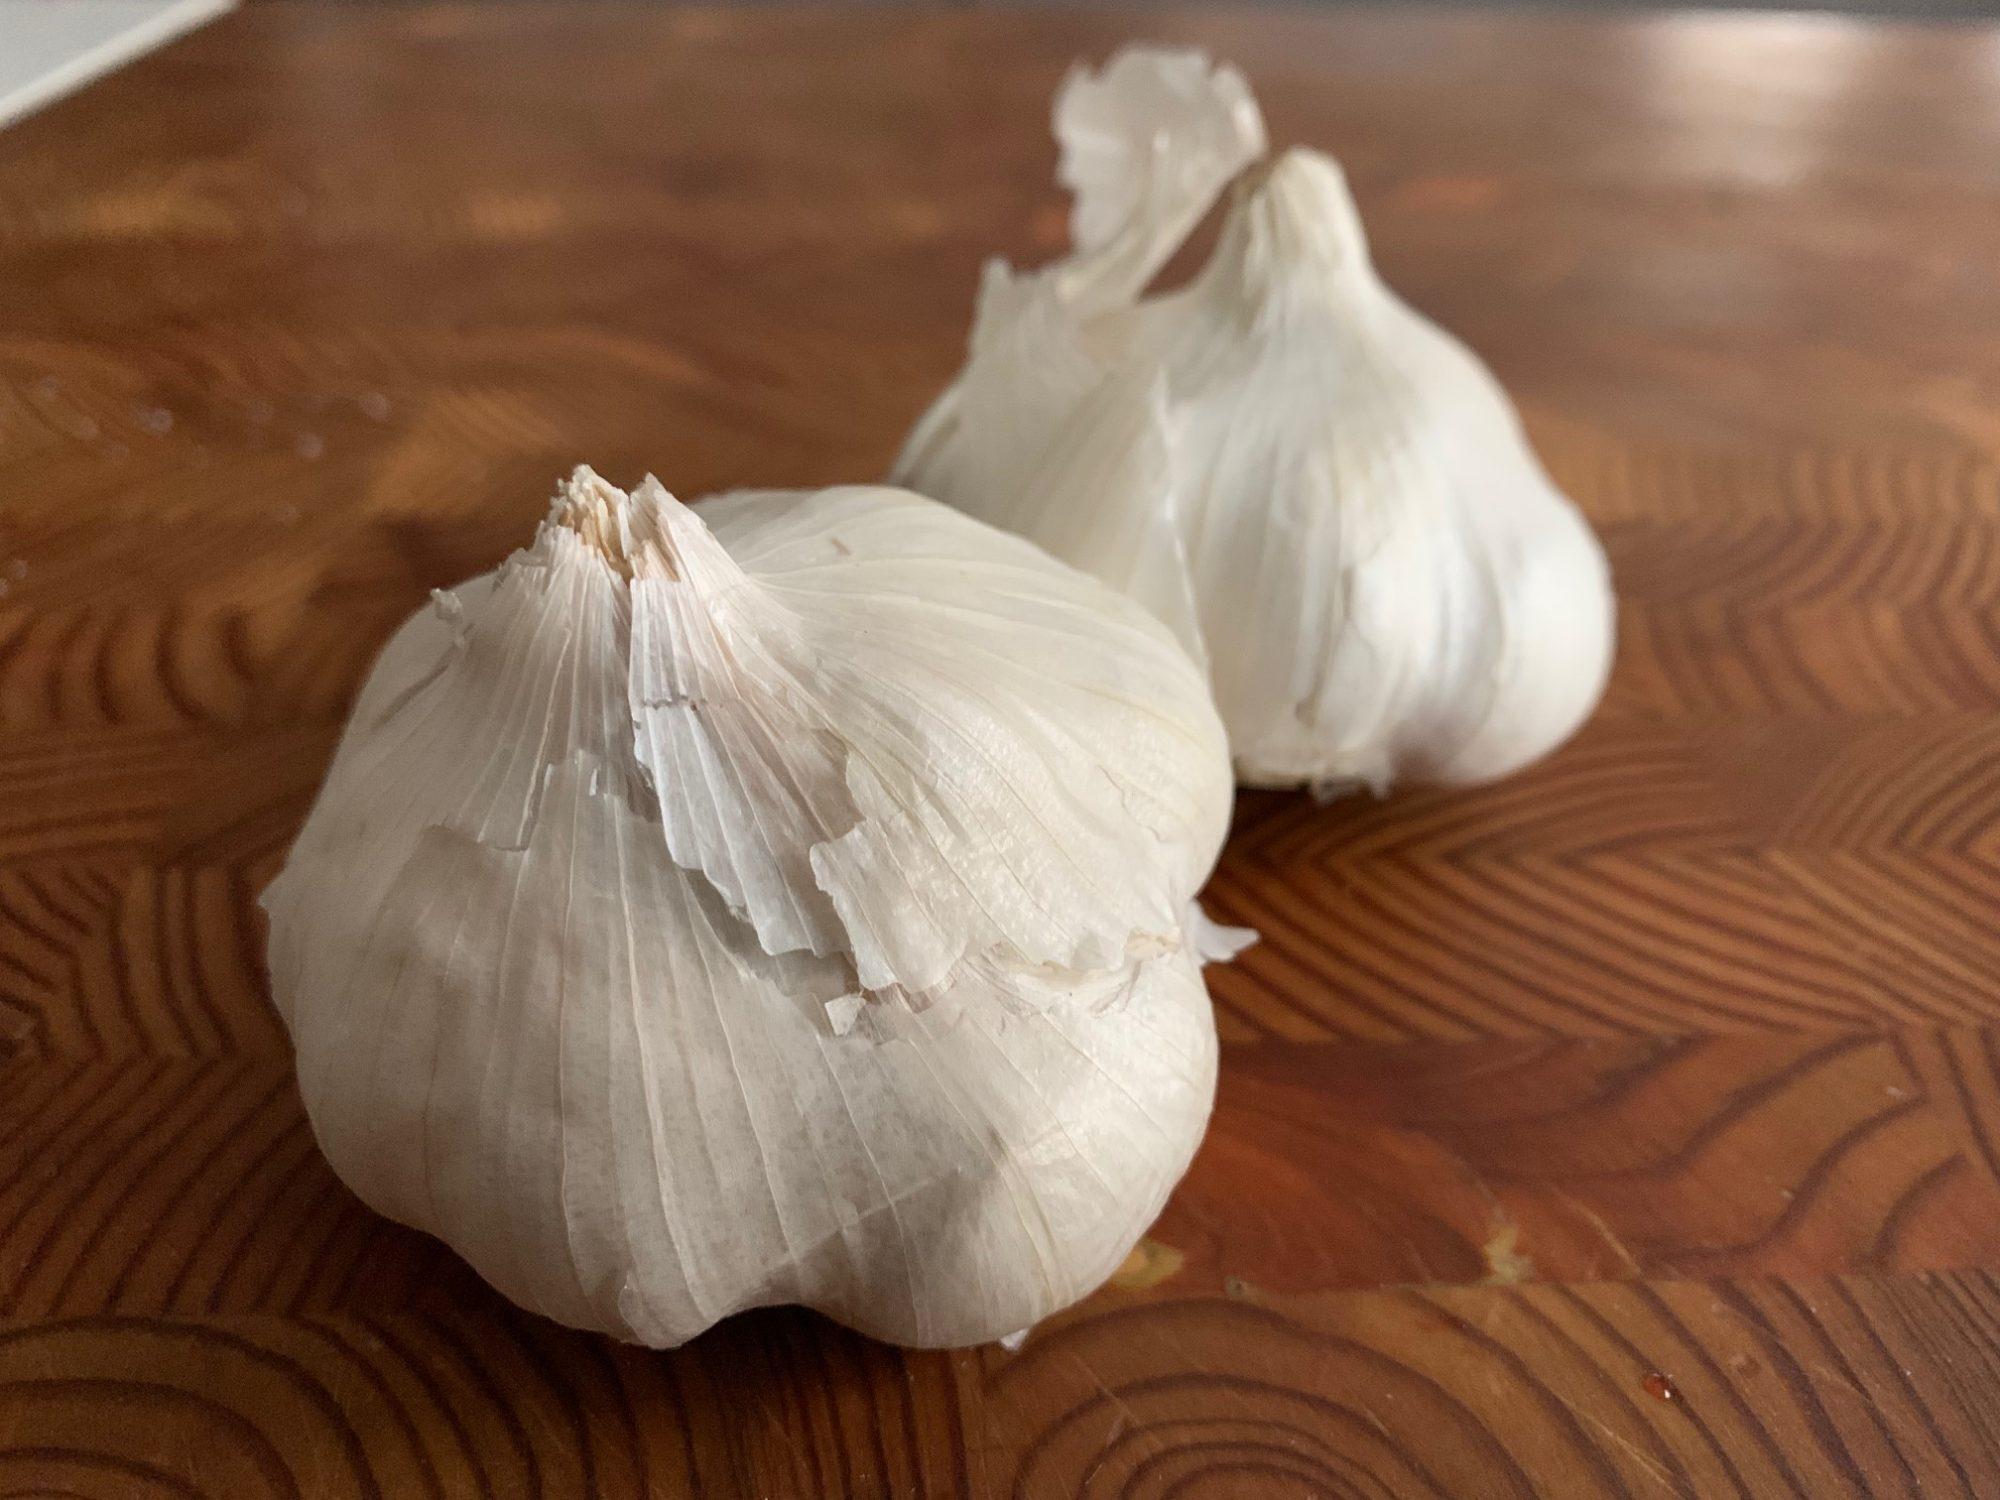 garlic with skin on